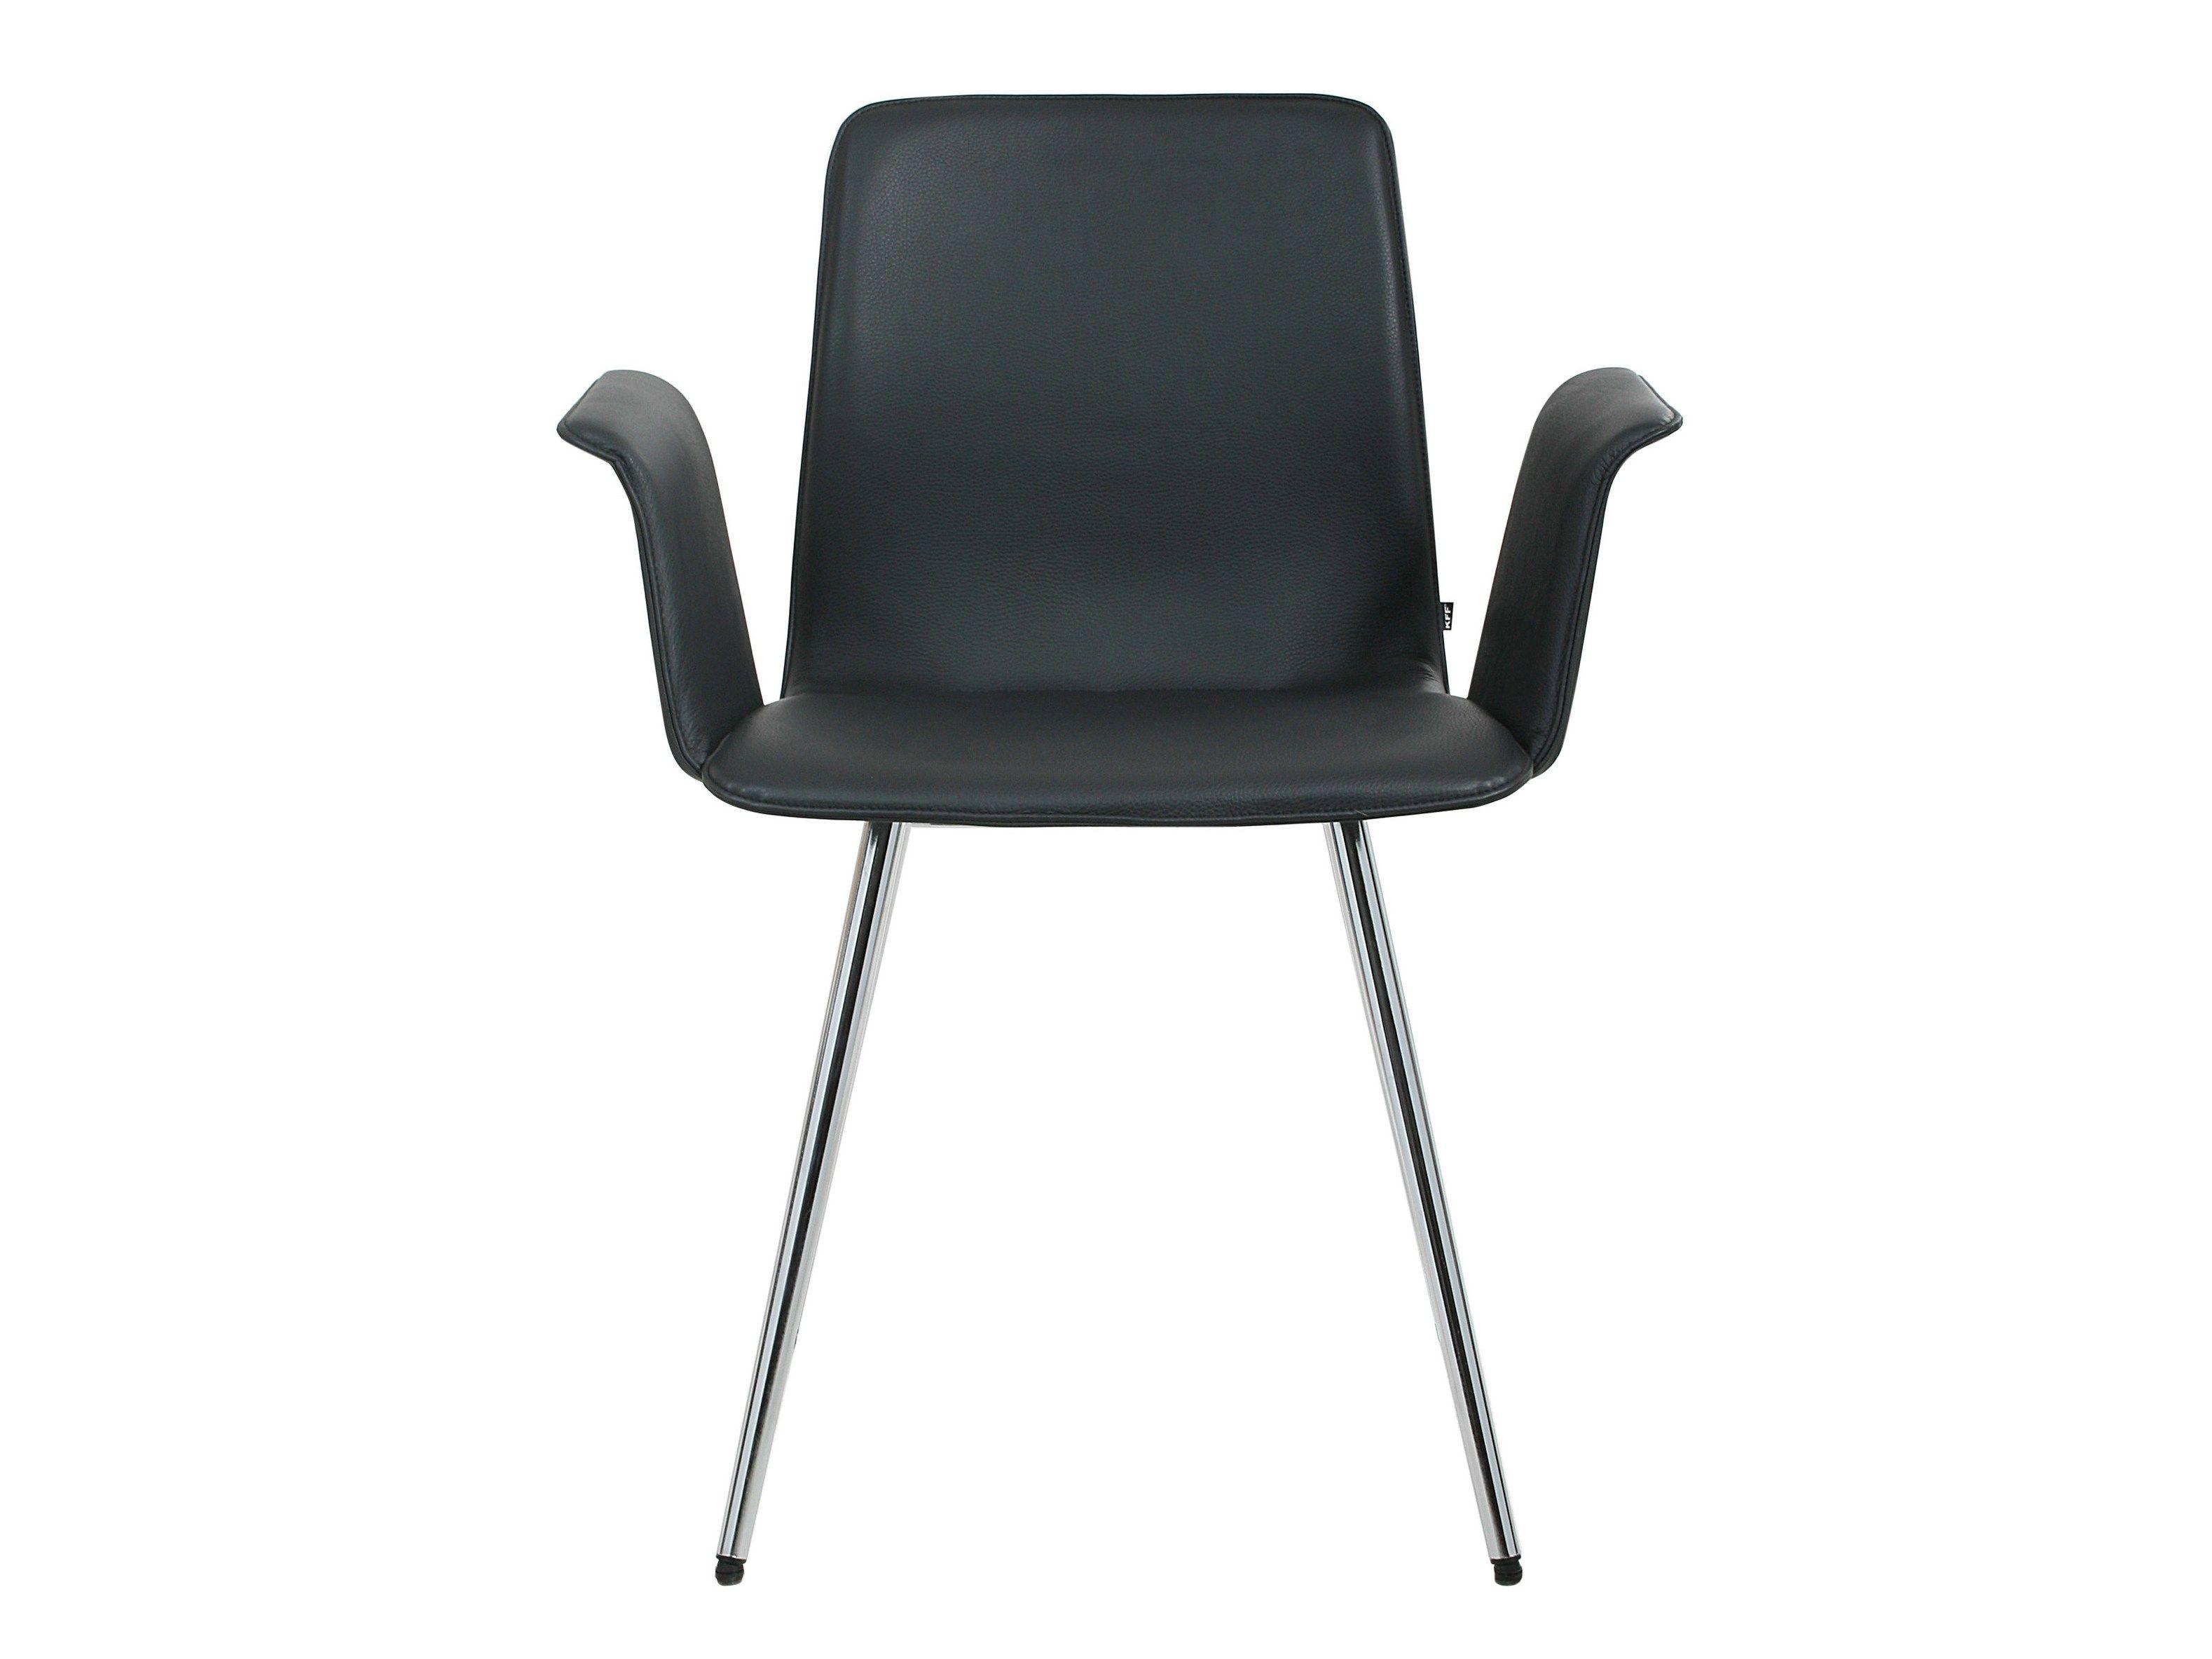 maverick konus stuhl mit armlehnen by kff design birgit hoffmann. Black Bedroom Furniture Sets. Home Design Ideas